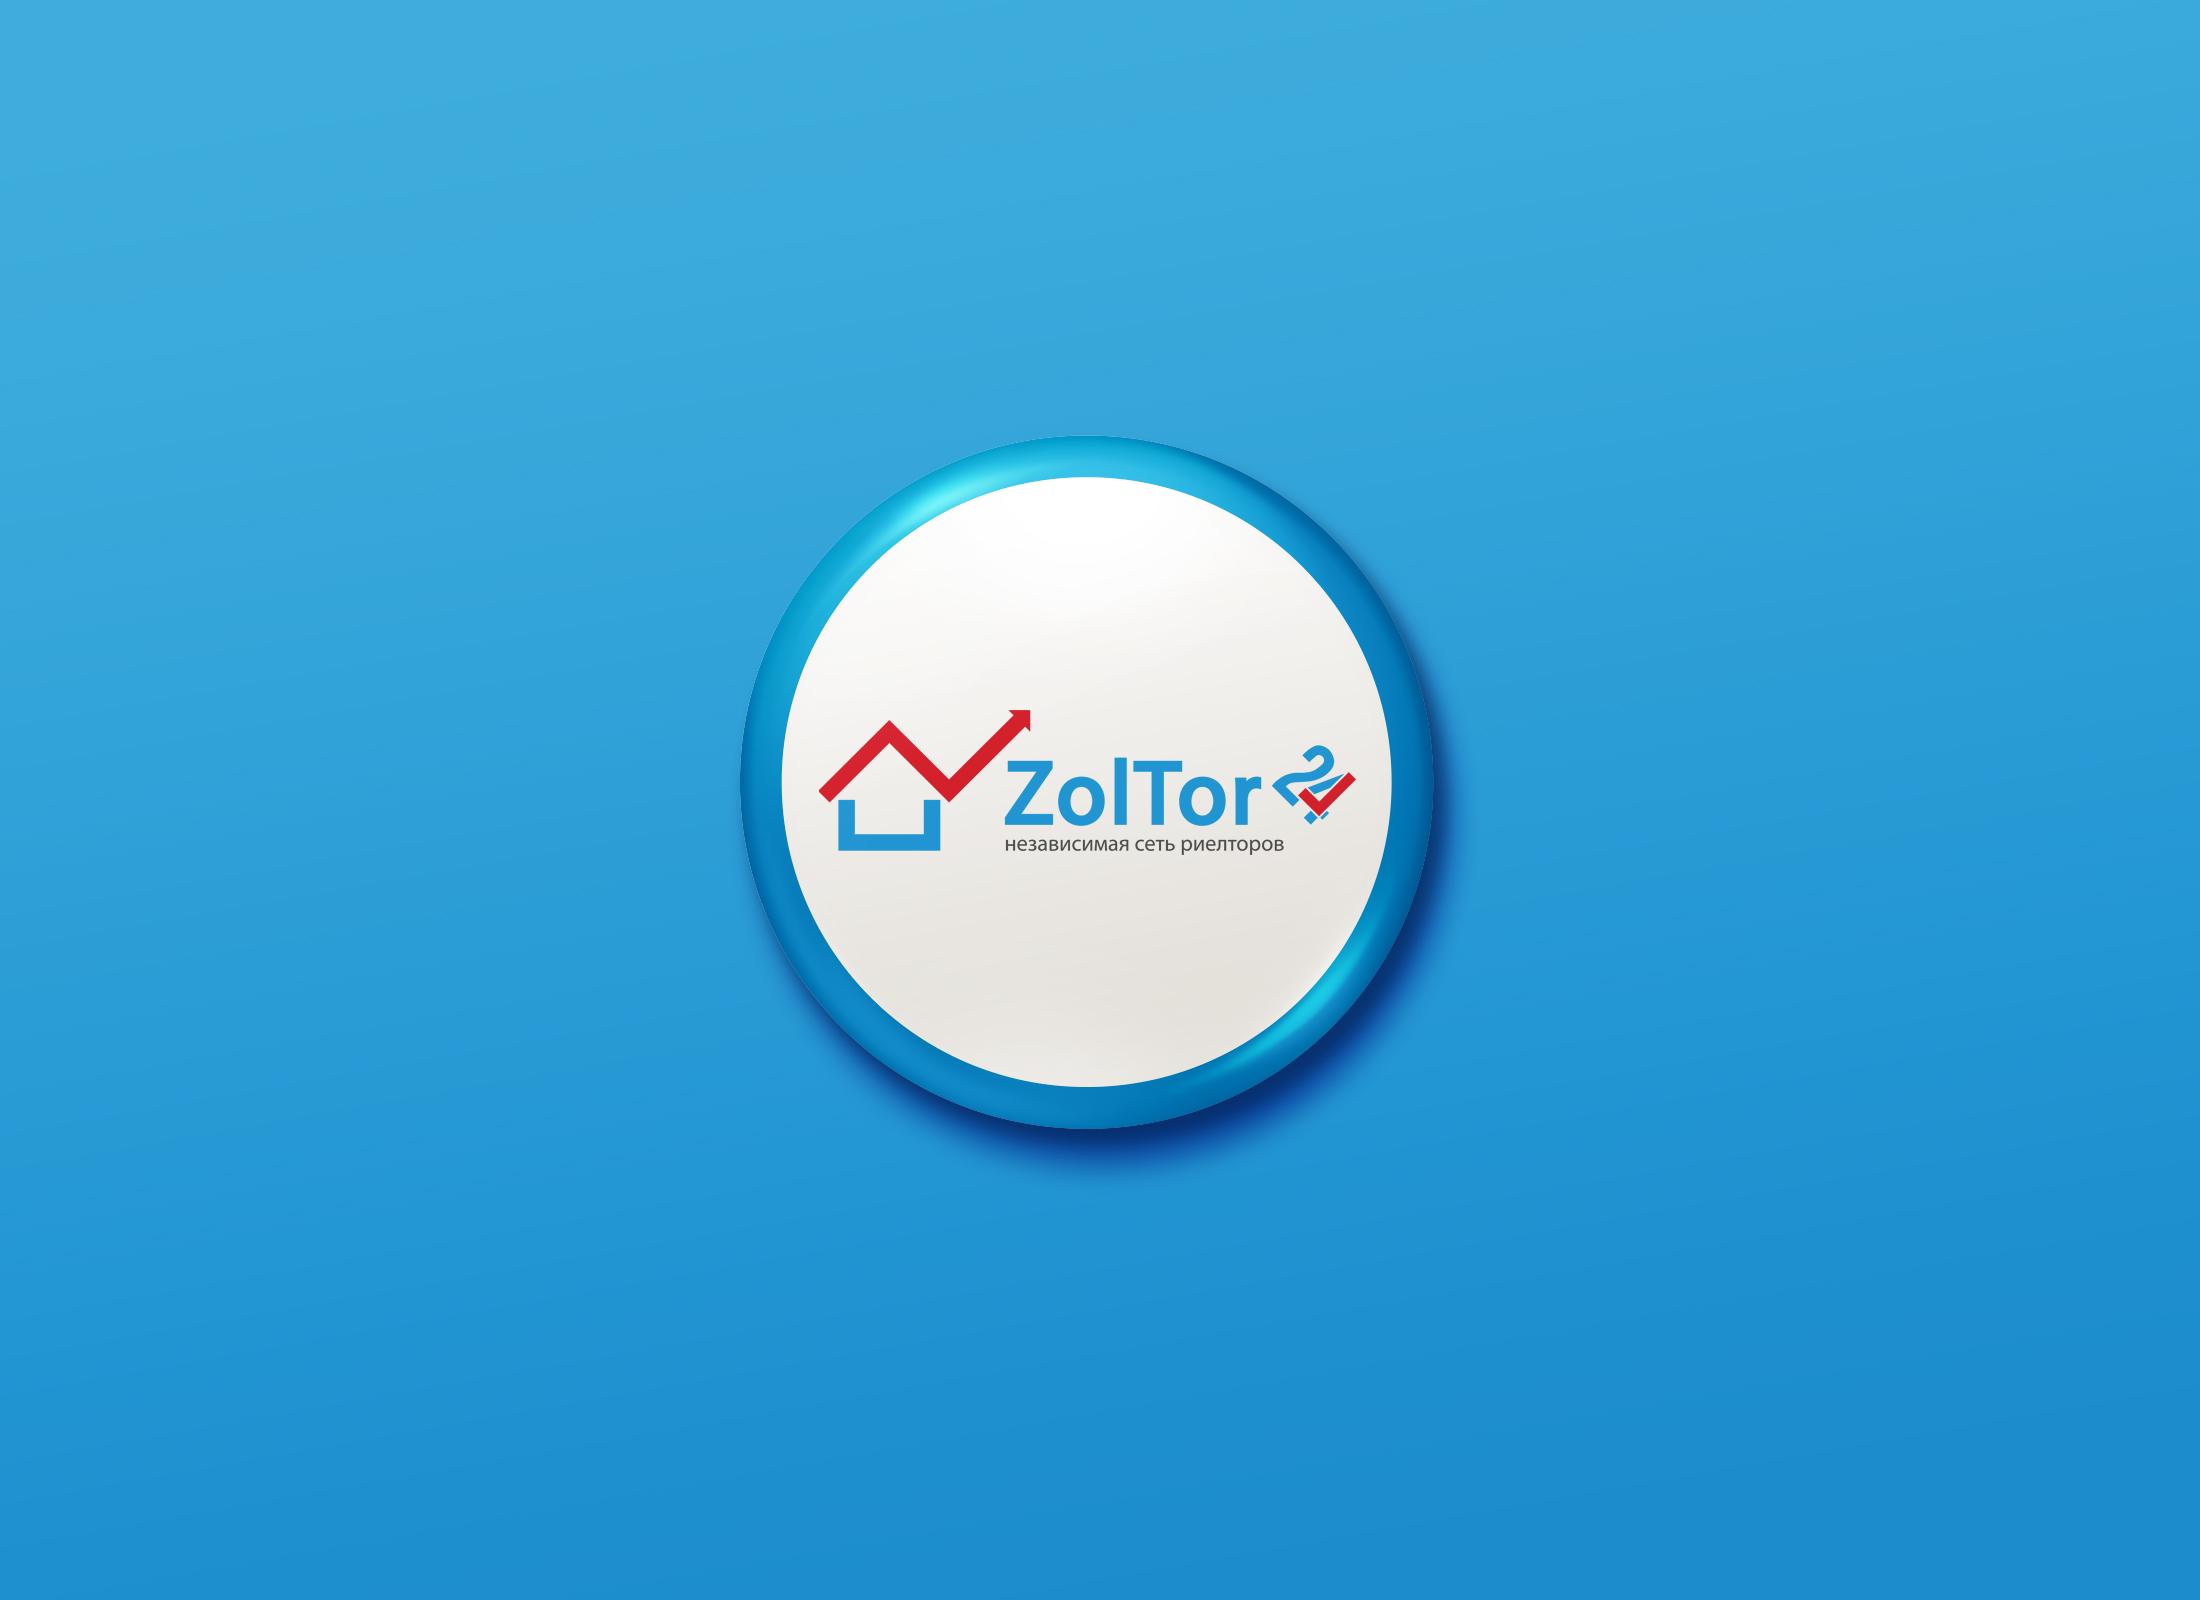 Логотип и фирменный стиль ZolTor24 фото f_4365c91912b56646.jpg